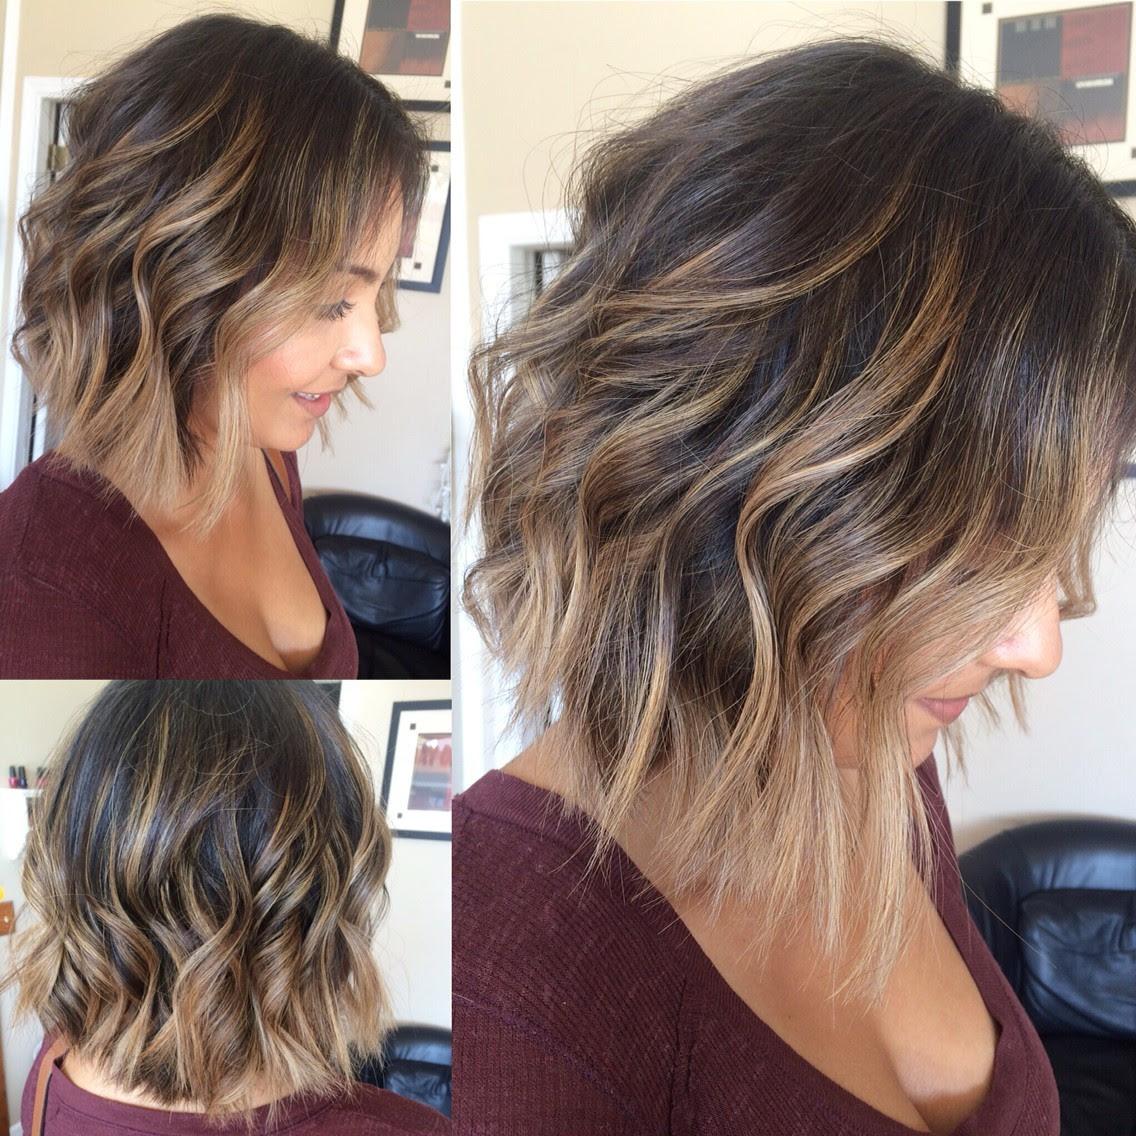 20 Lovely Medium Length Haircuts For 2019 Meidum Hair Styles For Women